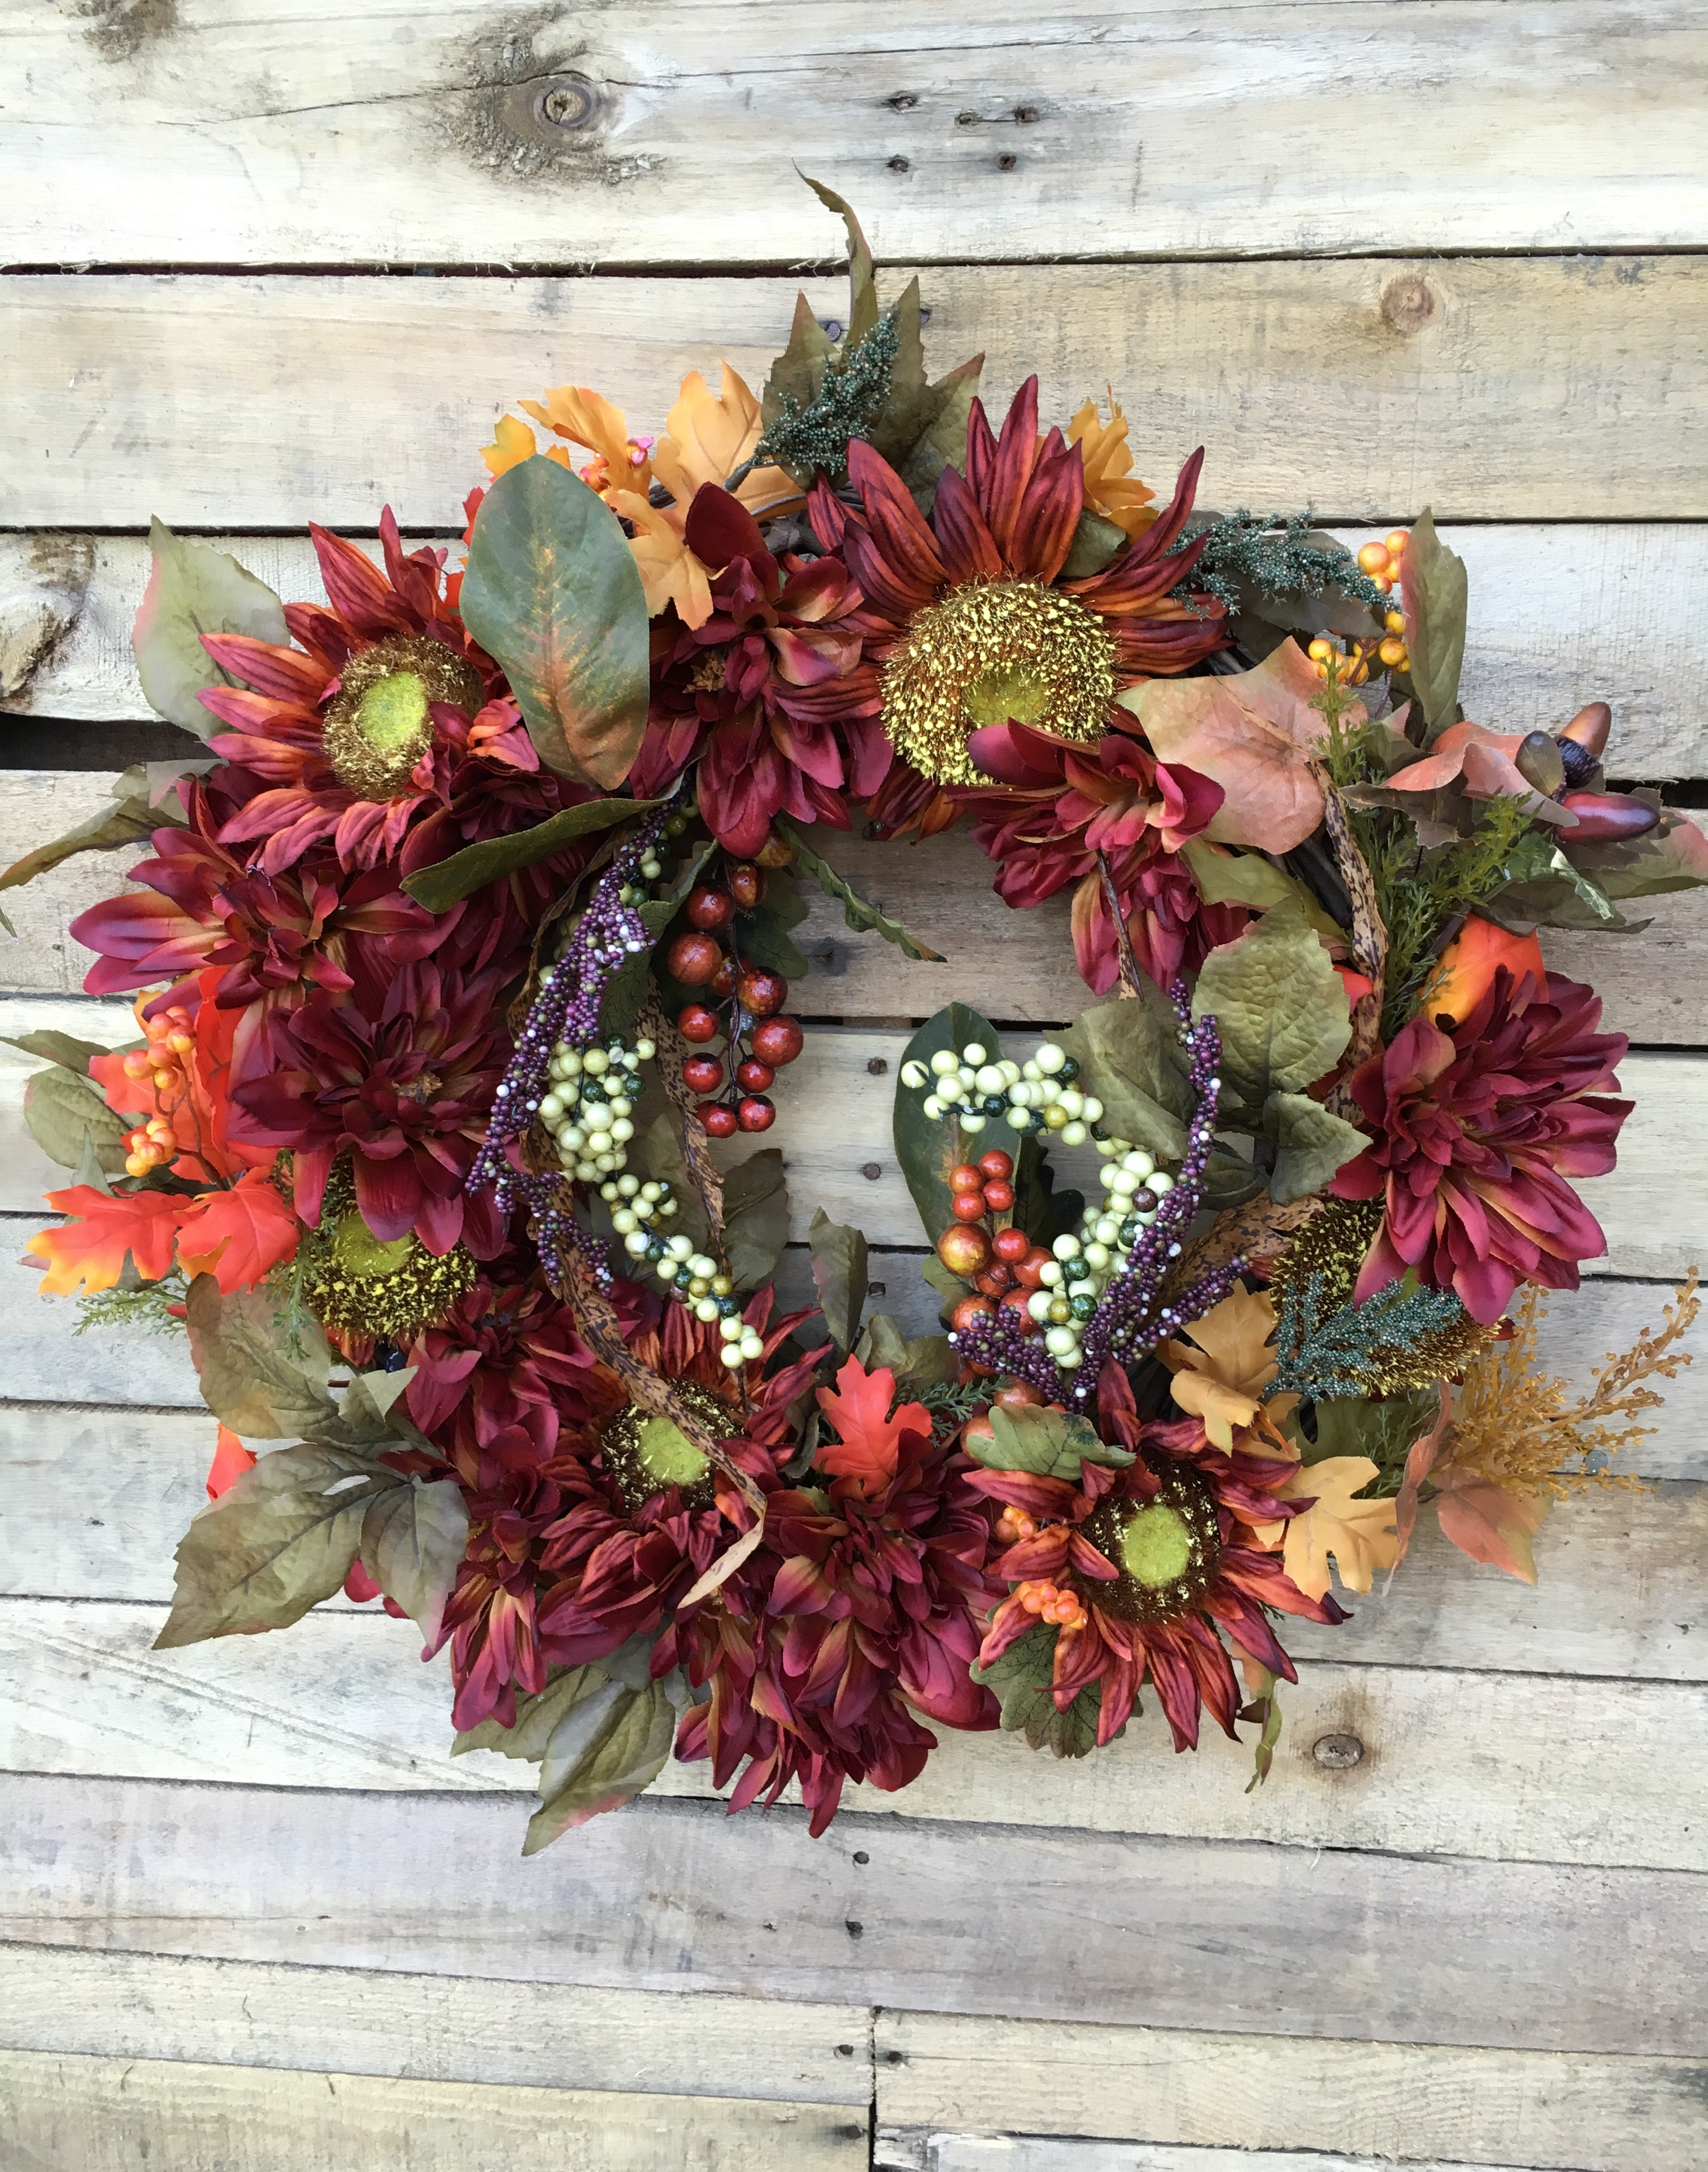 ... Fall Sunflowers Wreaths, Fall Flowers, Fall Mums. ; 